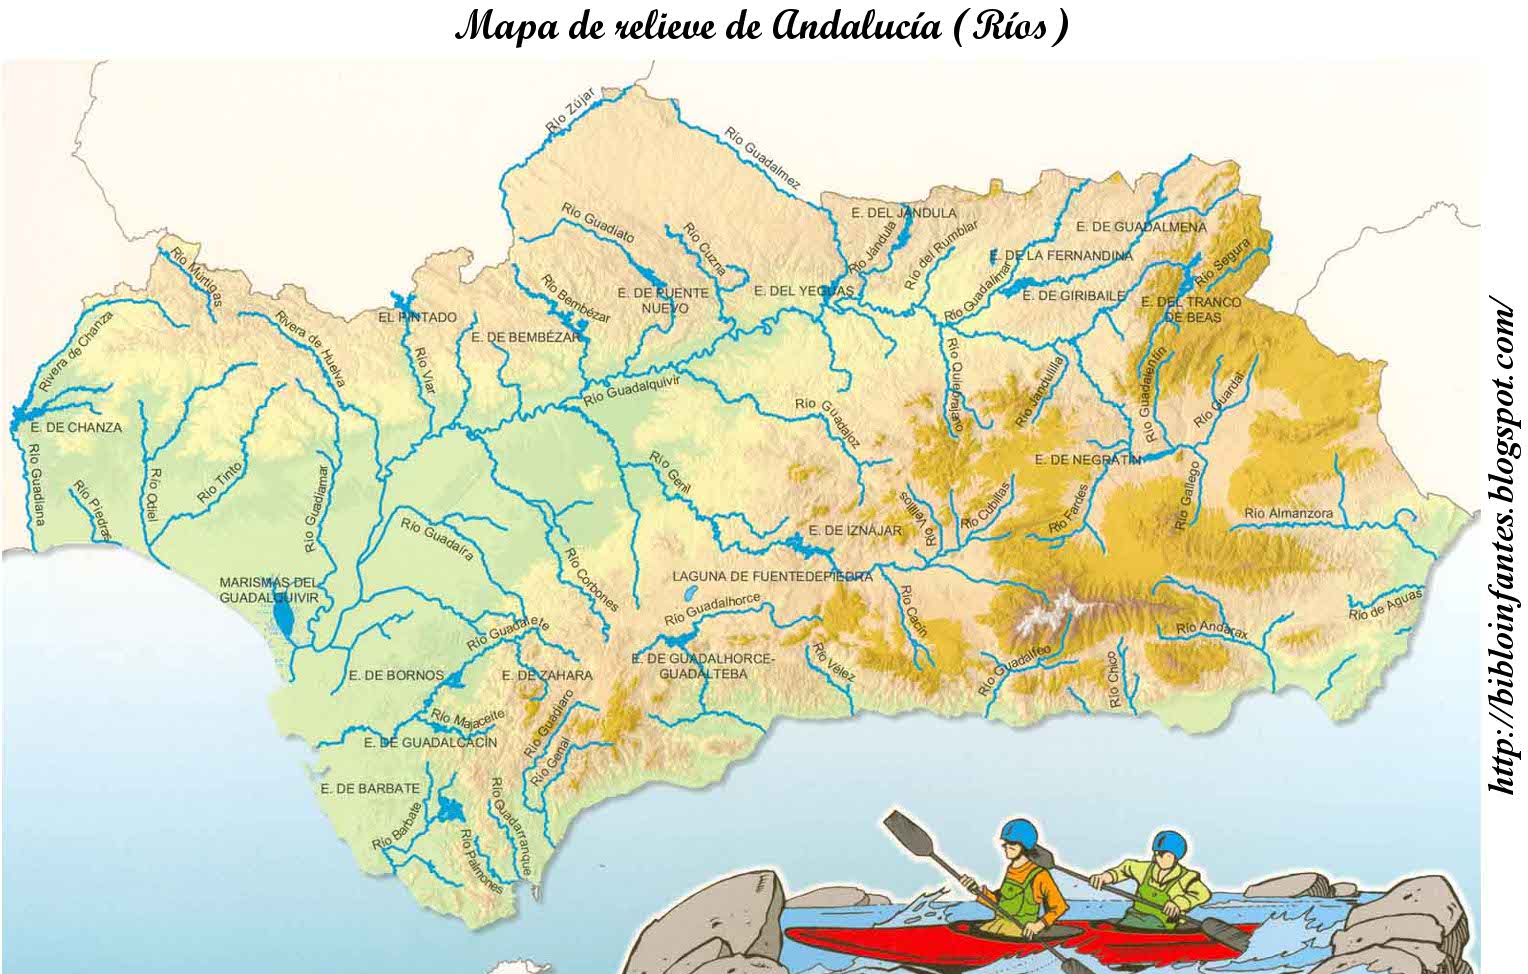 Mapa Rios Andalucia  My blog